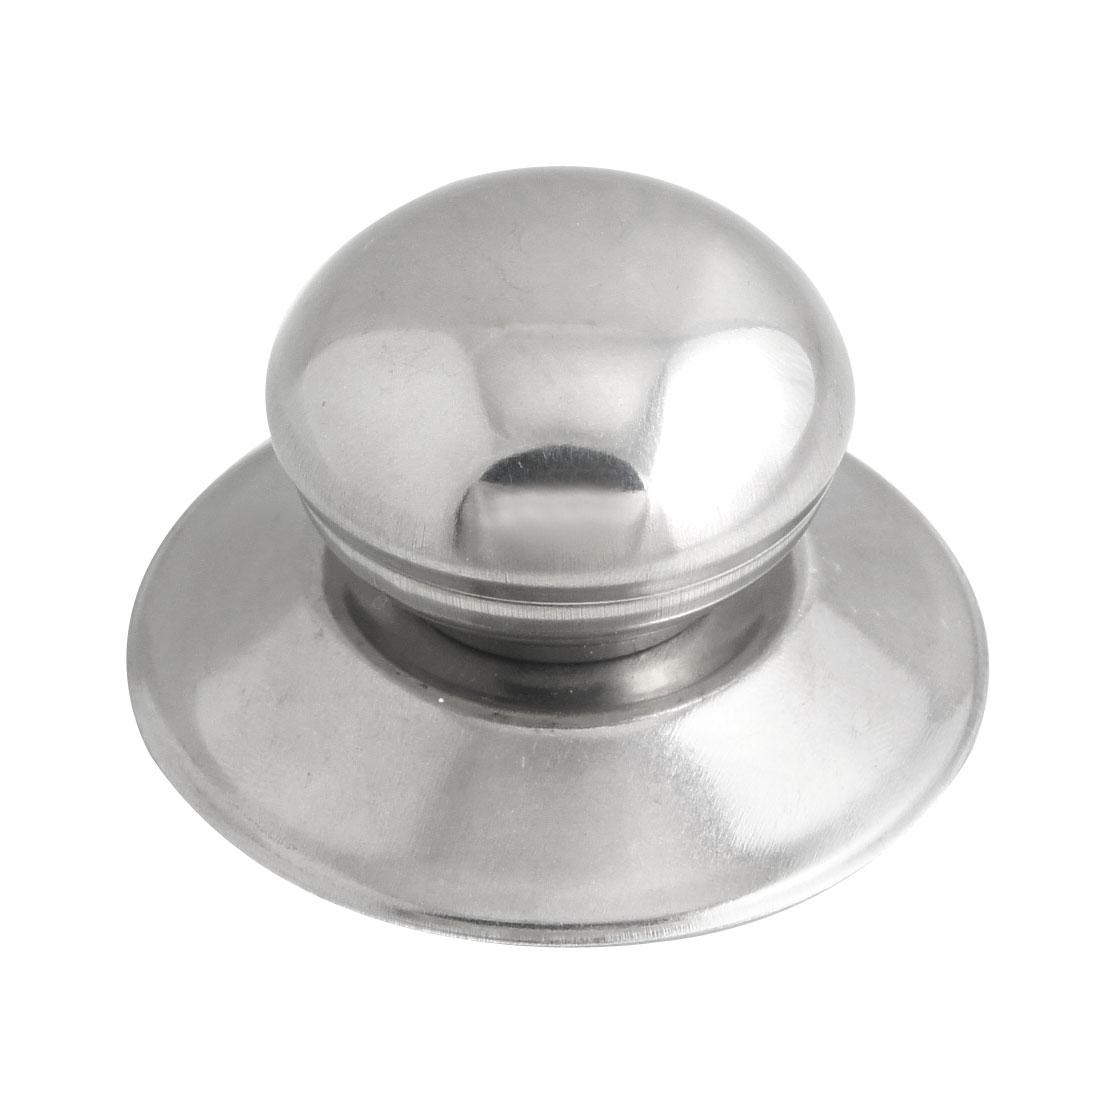 Kitchen Replacement Metal 4cm Knob Dia Pot Kettle Lid Knob Silver Tone